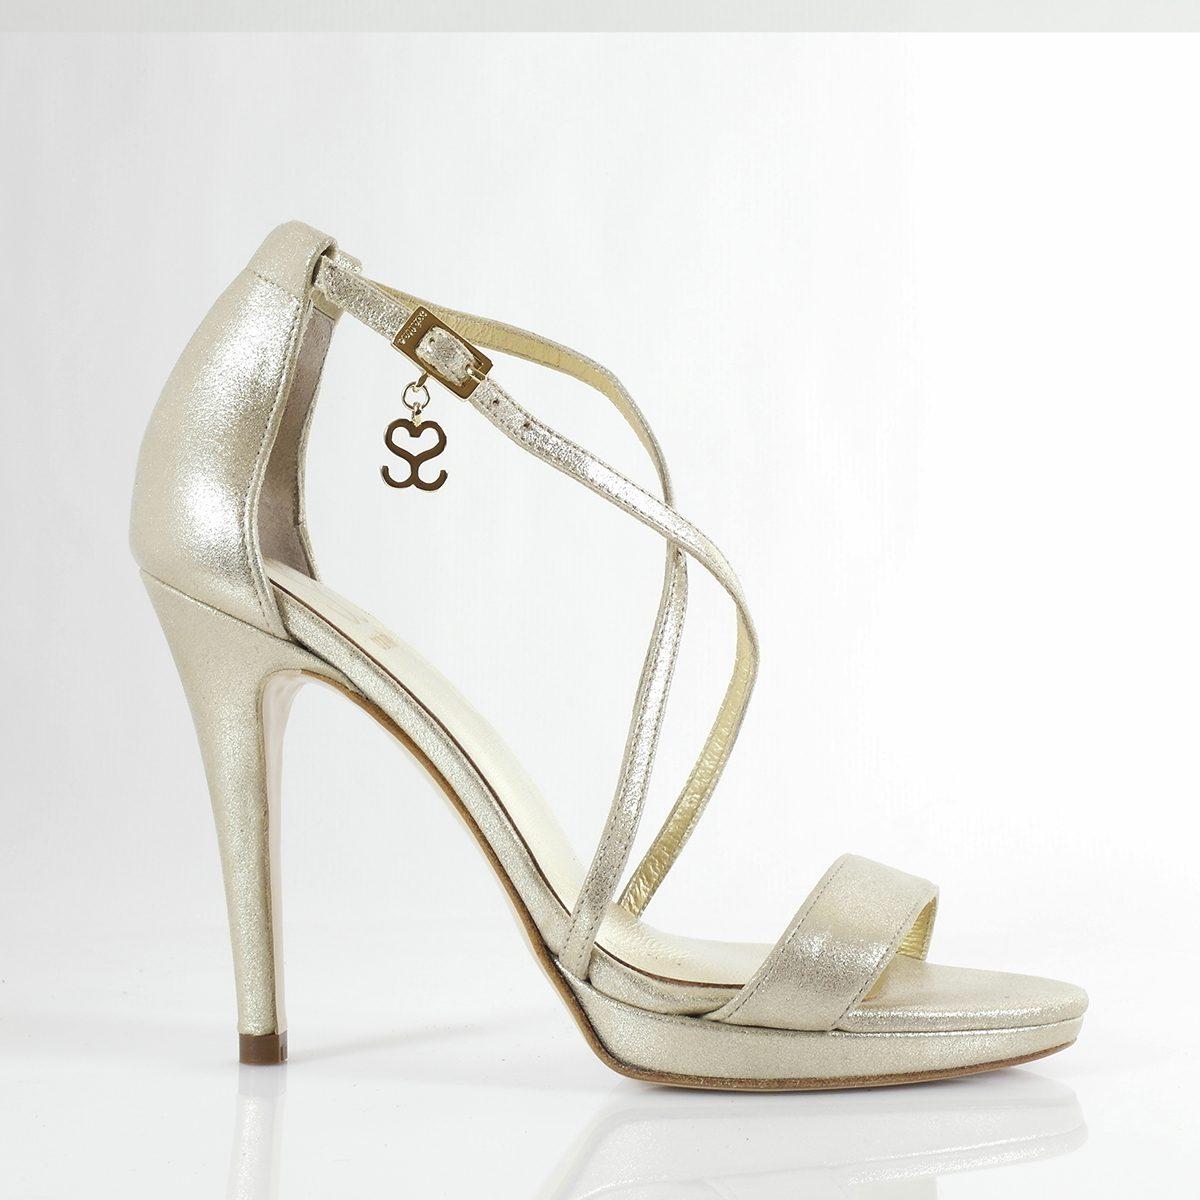 SANDALIA MOD.9378 (11cm) - Zapatos Personalizados Fiesta